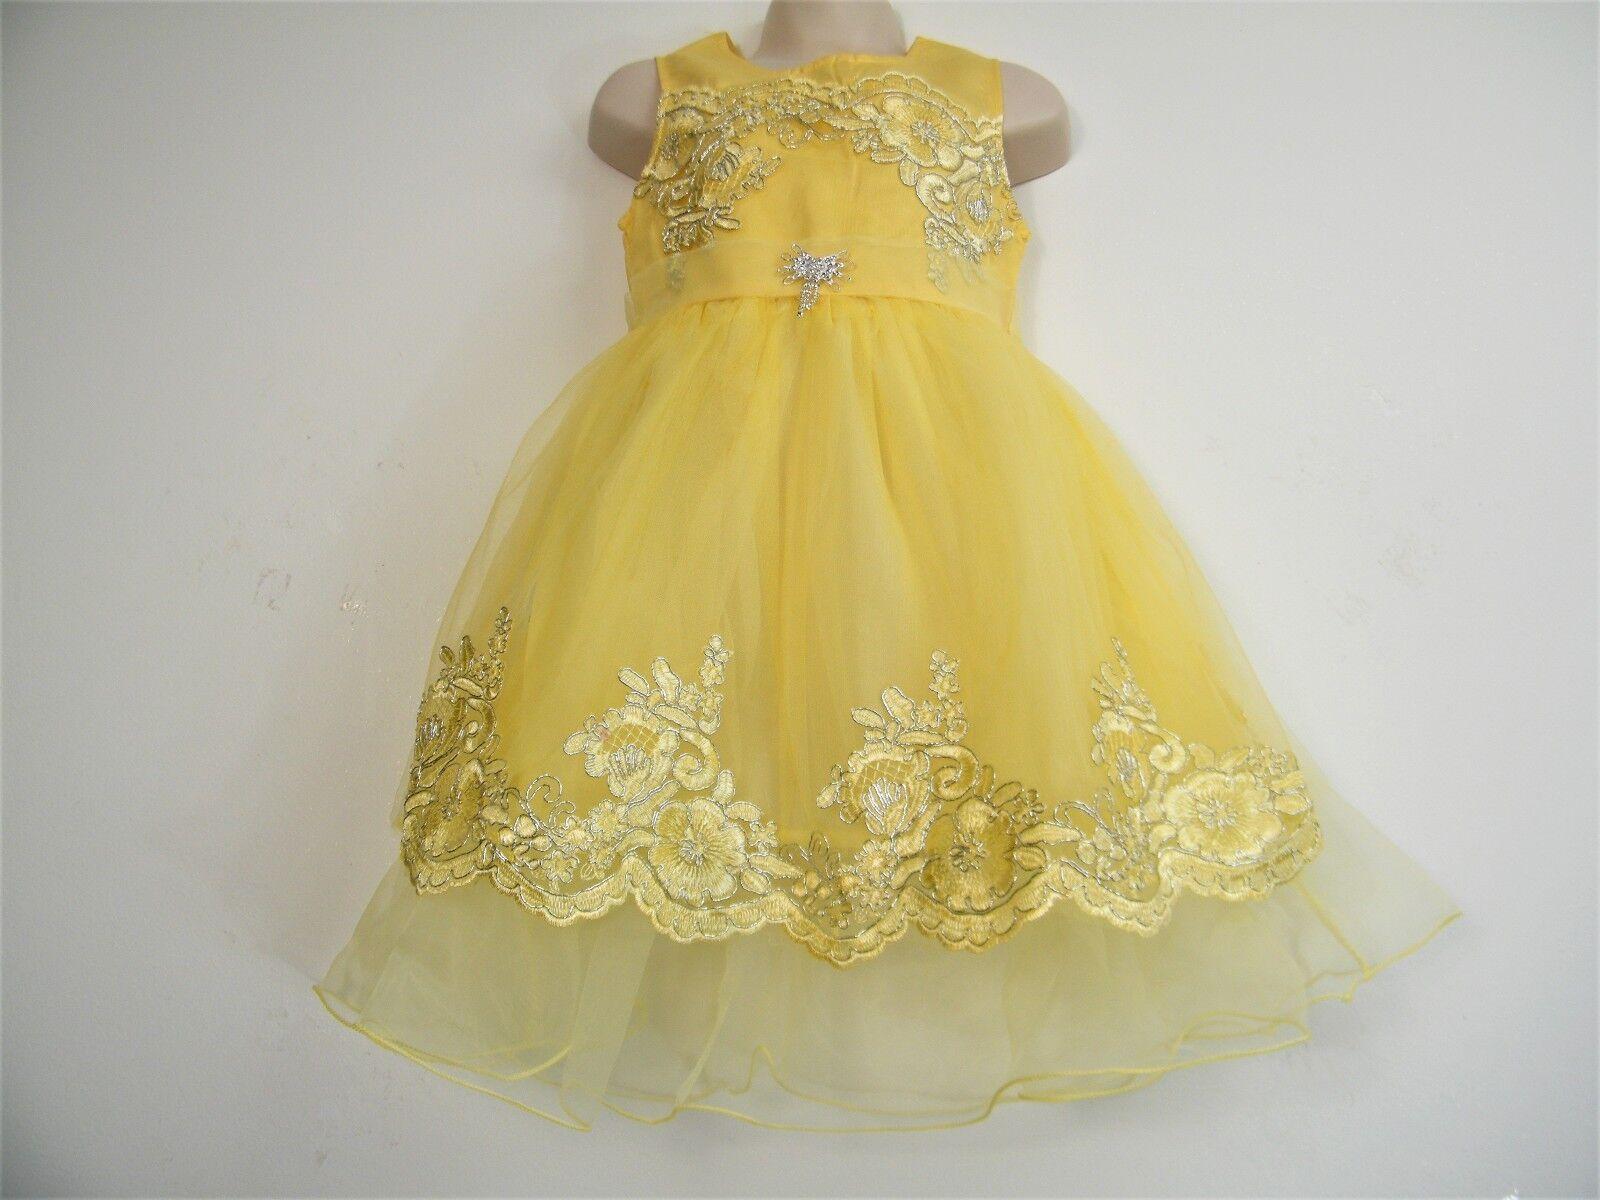 LEMON LACE & NET TUTU PARTY FLOWER GIRL WEDDING PRINCESS DRESS AGE 3-14